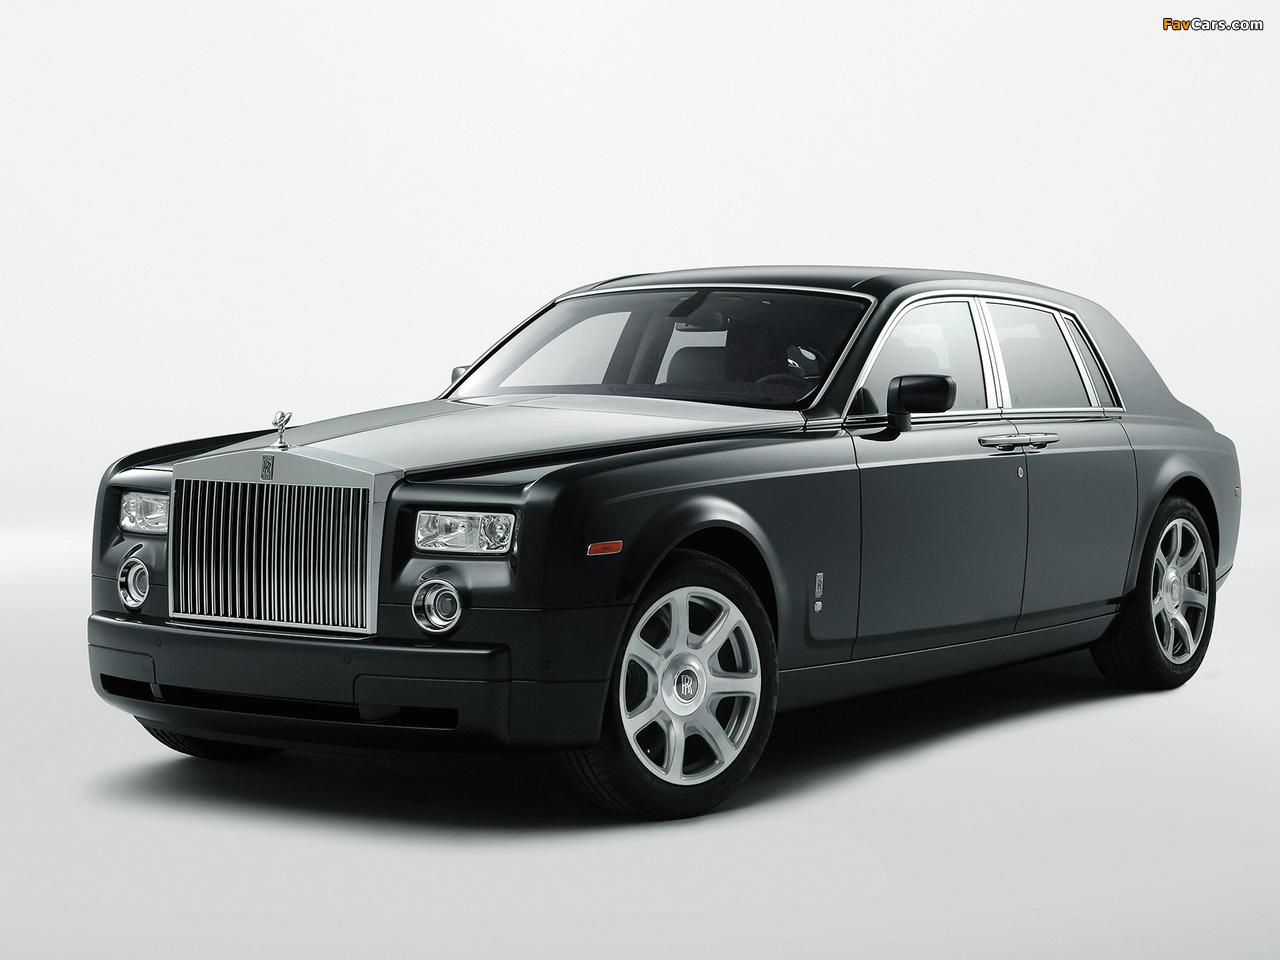 Images of Rolls-Royce Phantom Tungsten 2007 (1280 x 960)